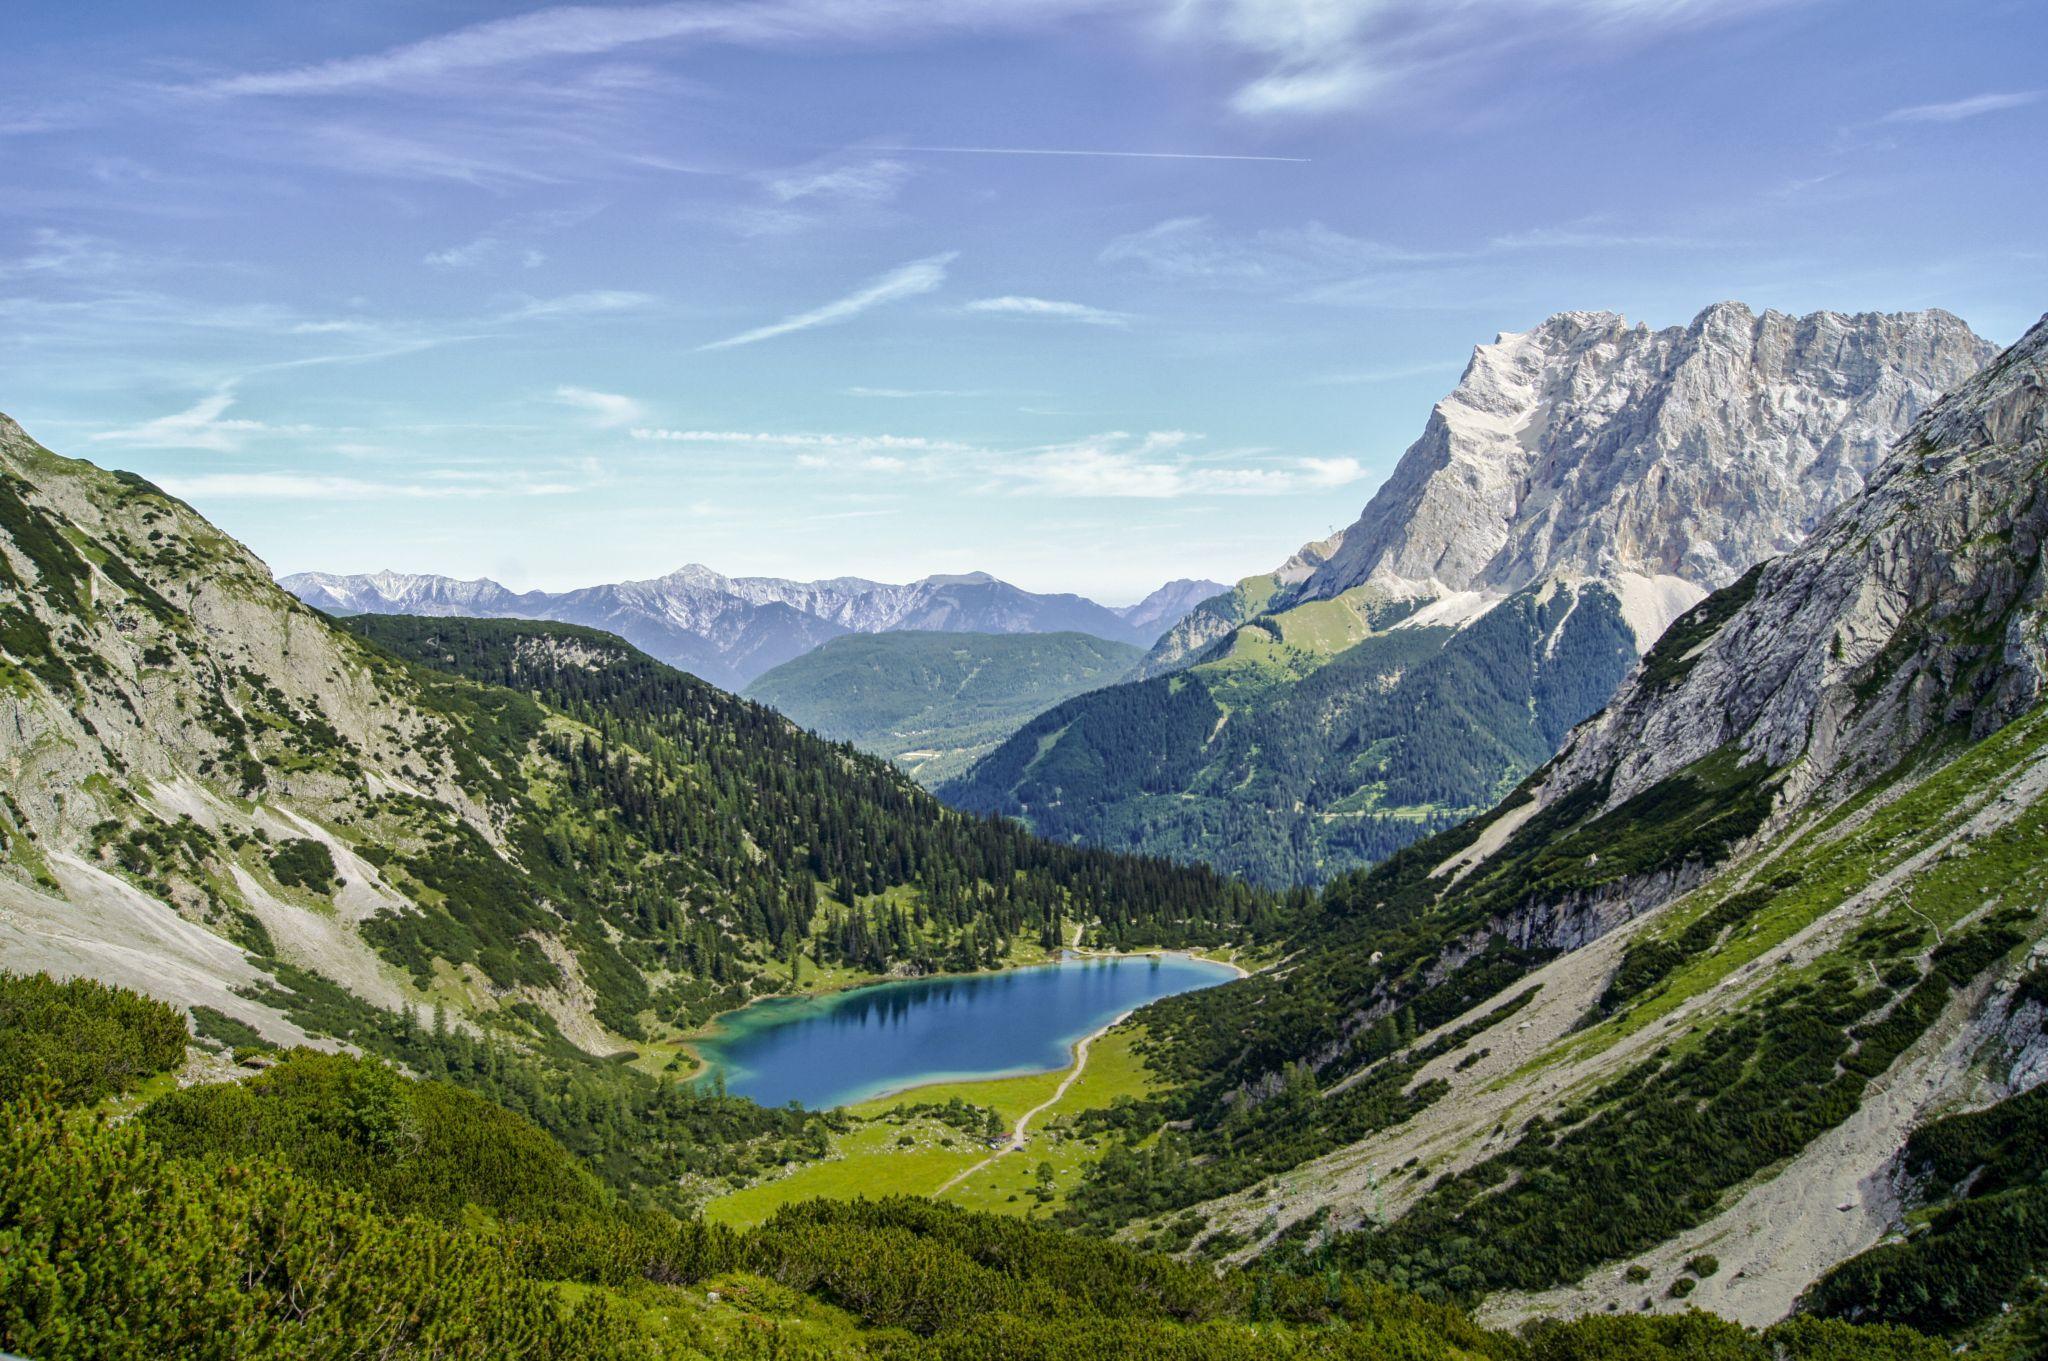 Coburger Hütte and Drachensee, View to Seebensee, Austria